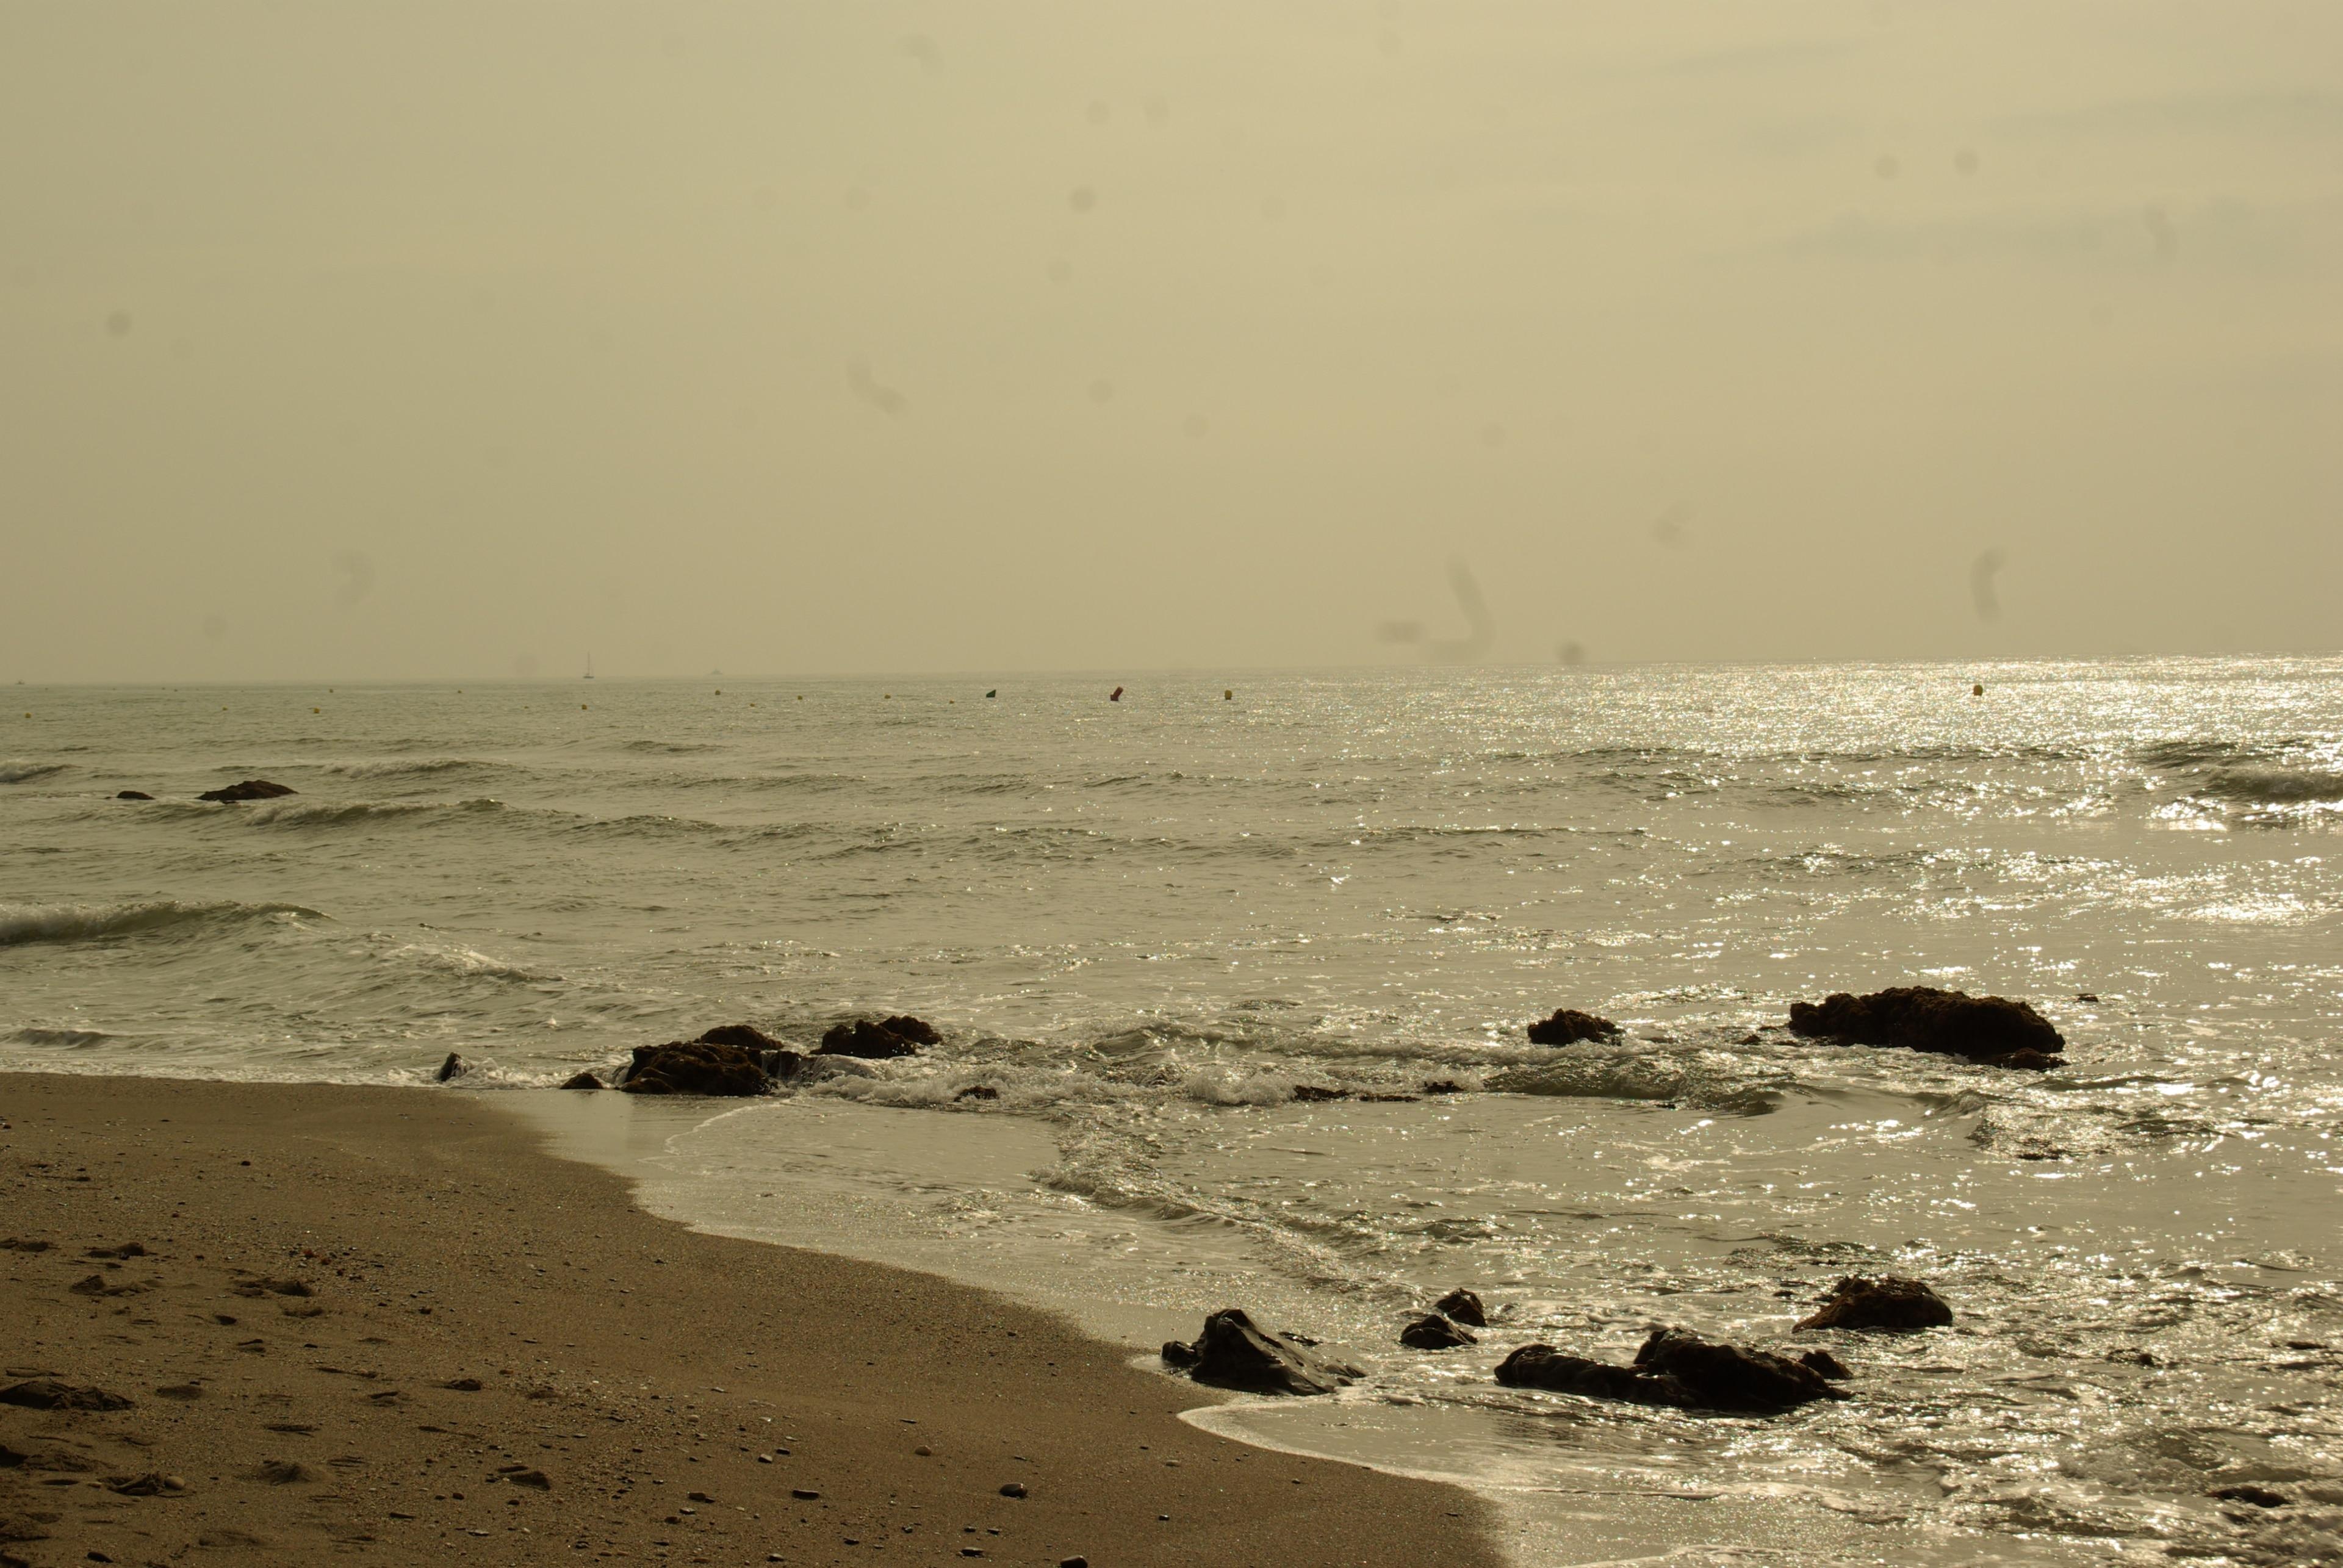 La Luna Beach, Mijas, Andalusien, Spanien